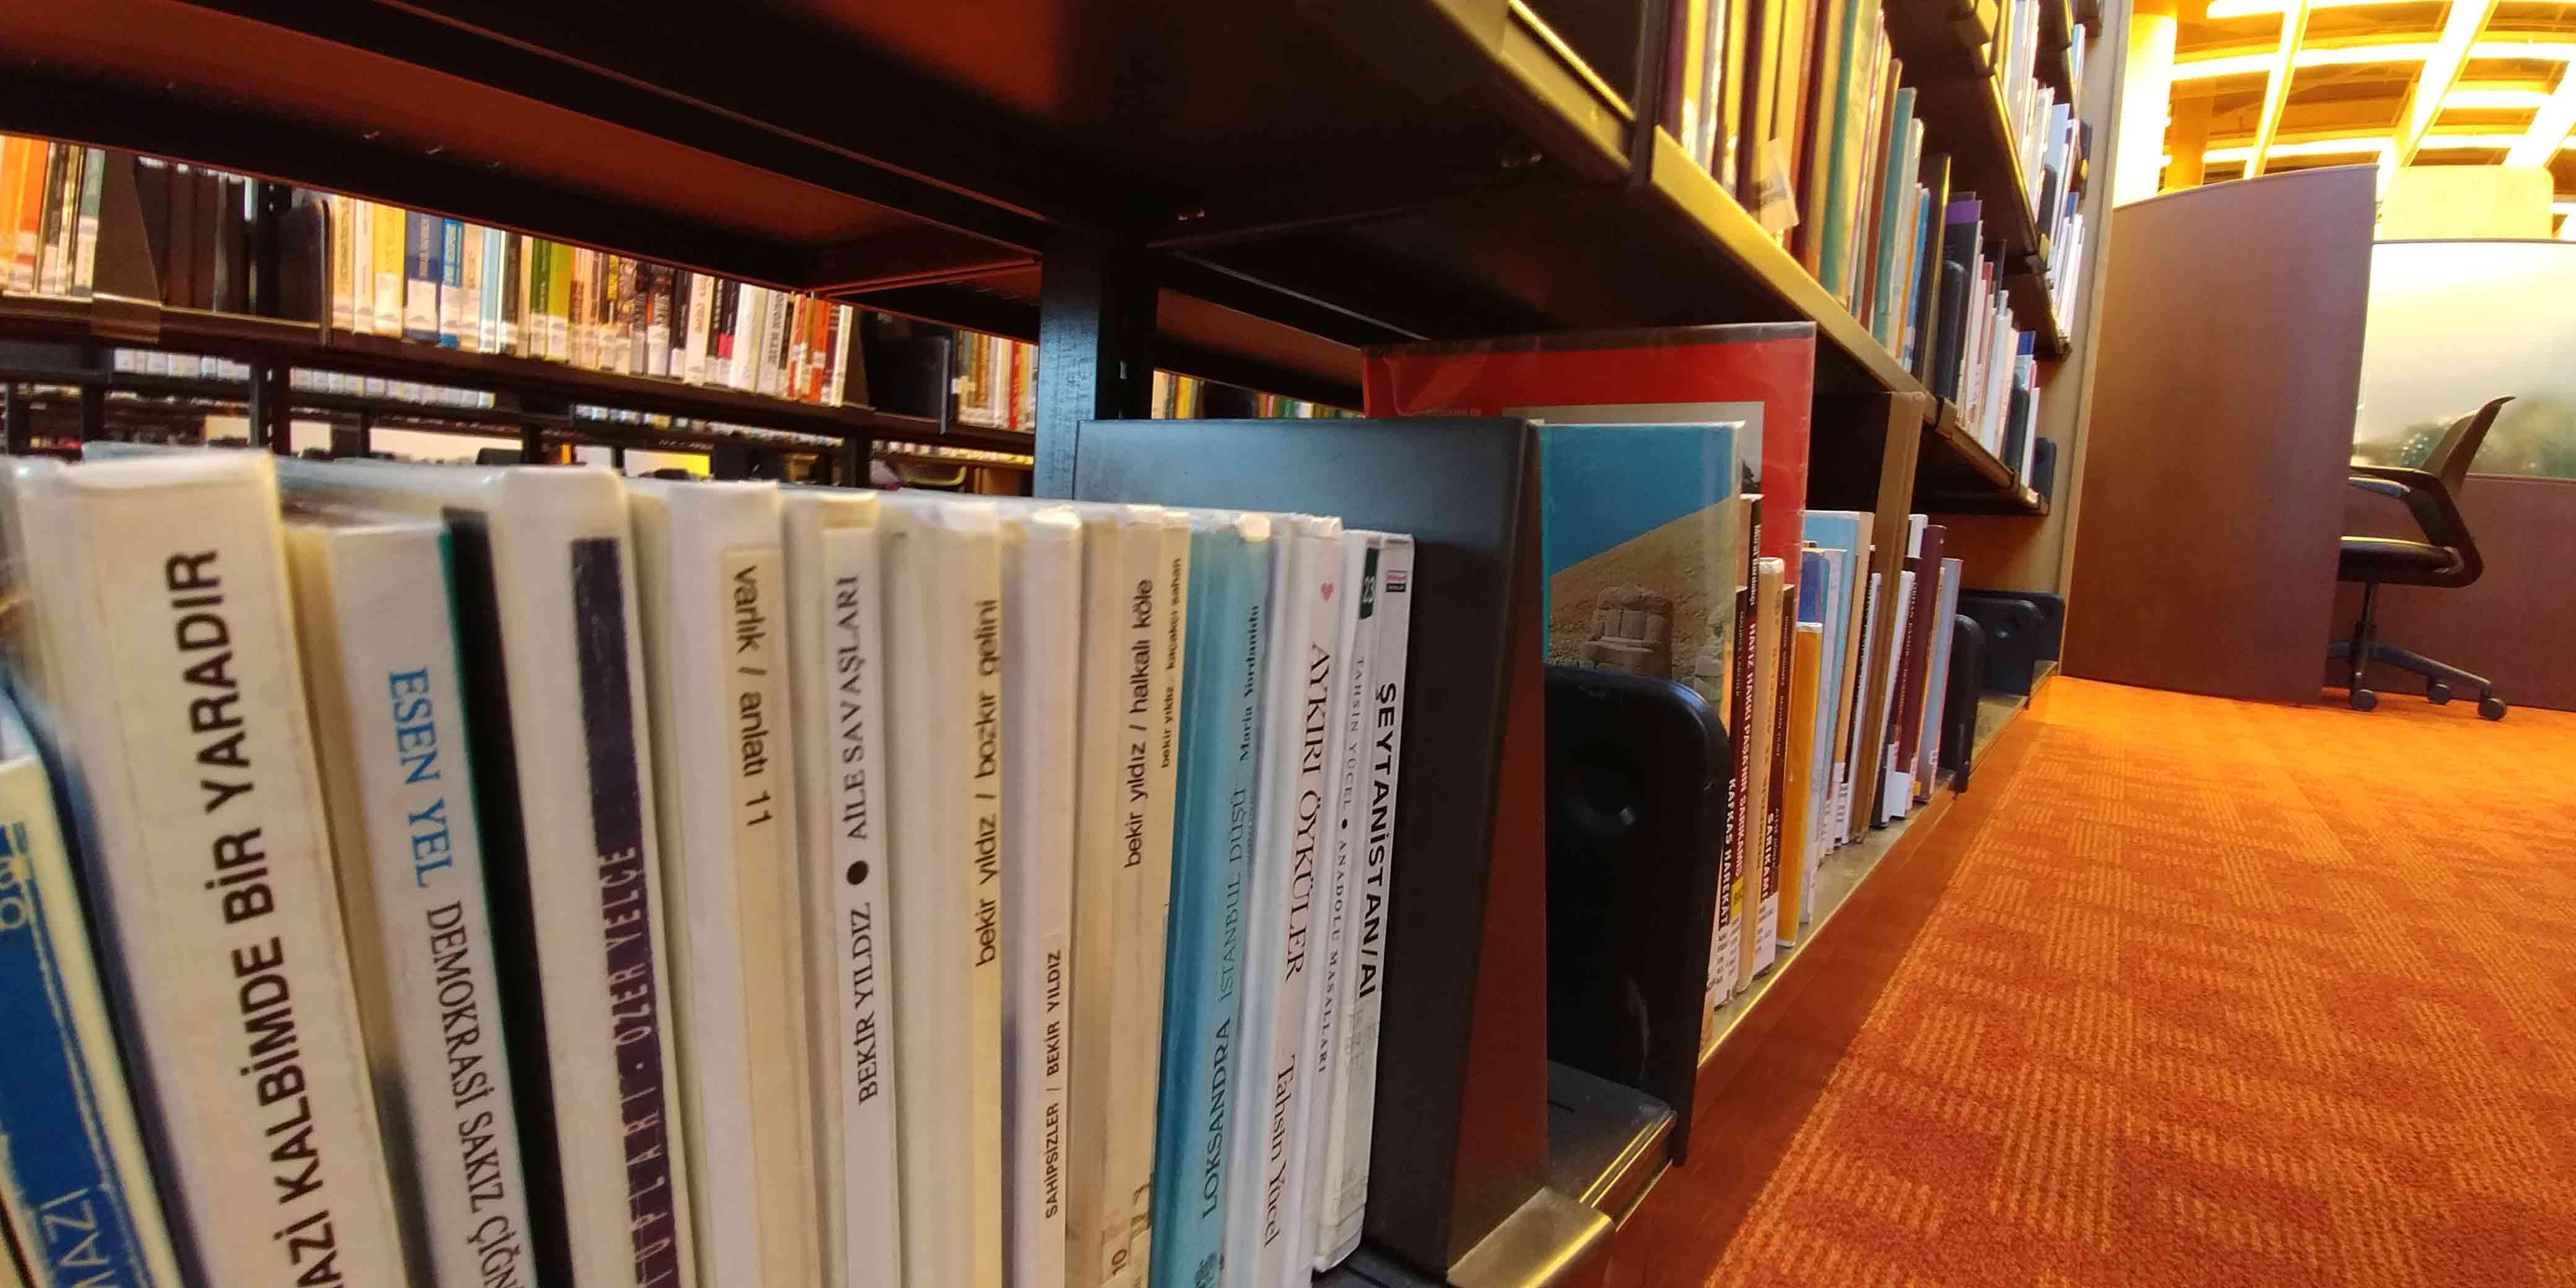 lg-g6-books-wide-1